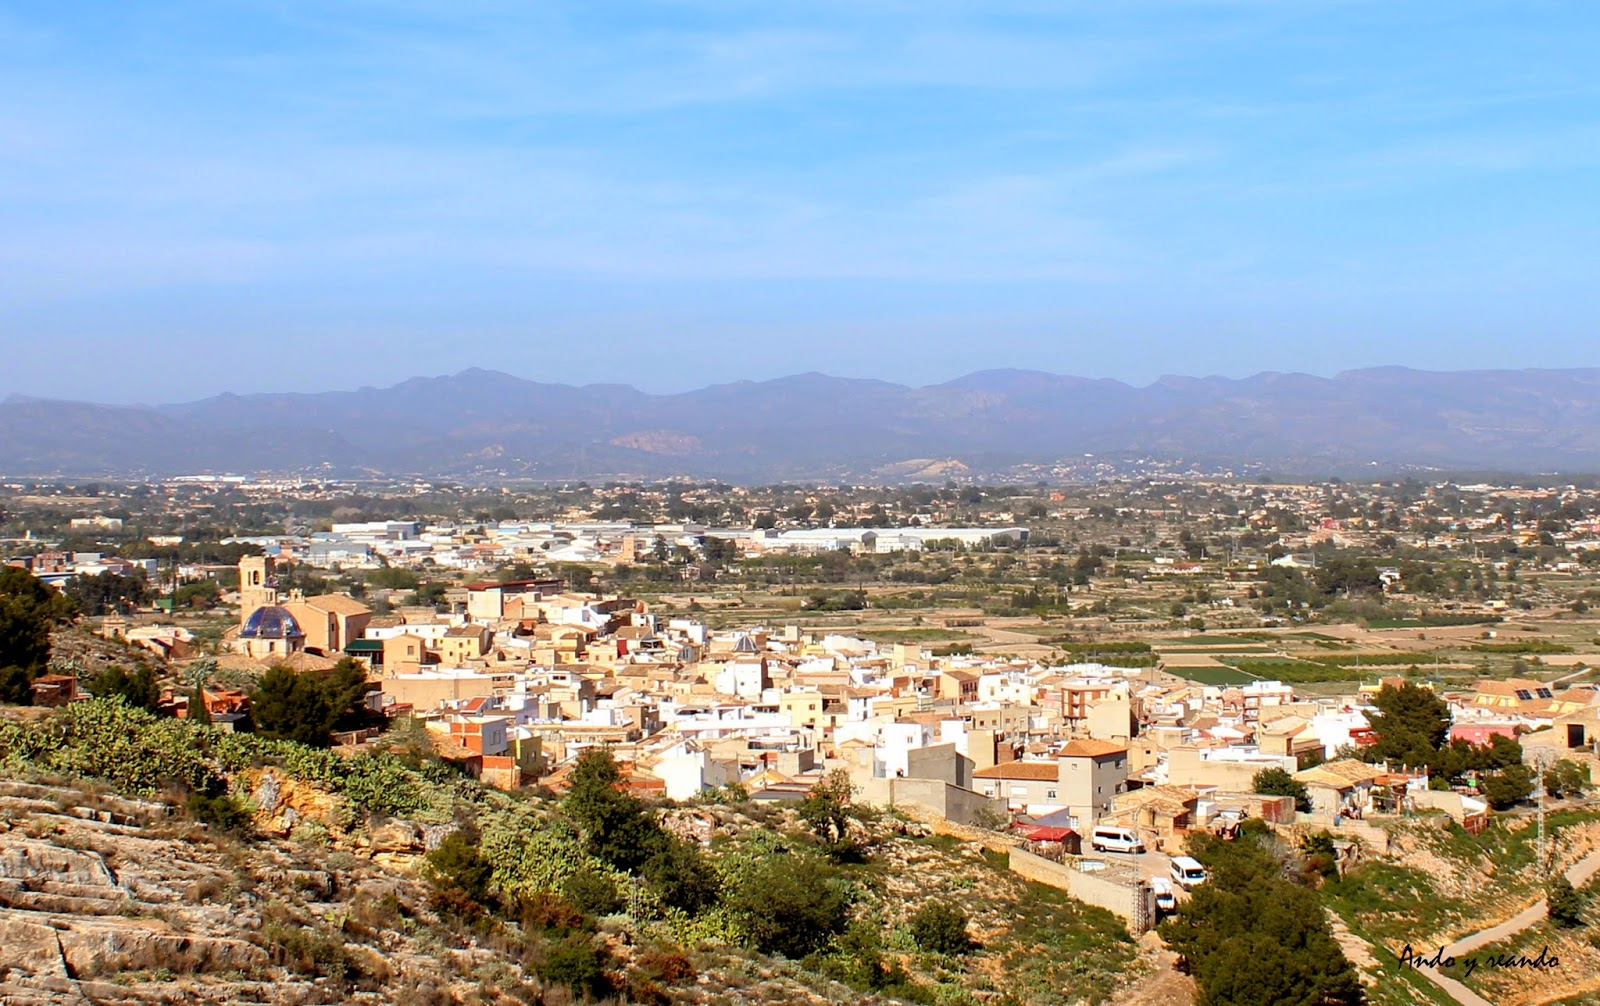 Liria-Sierra Calderona (Valencia)